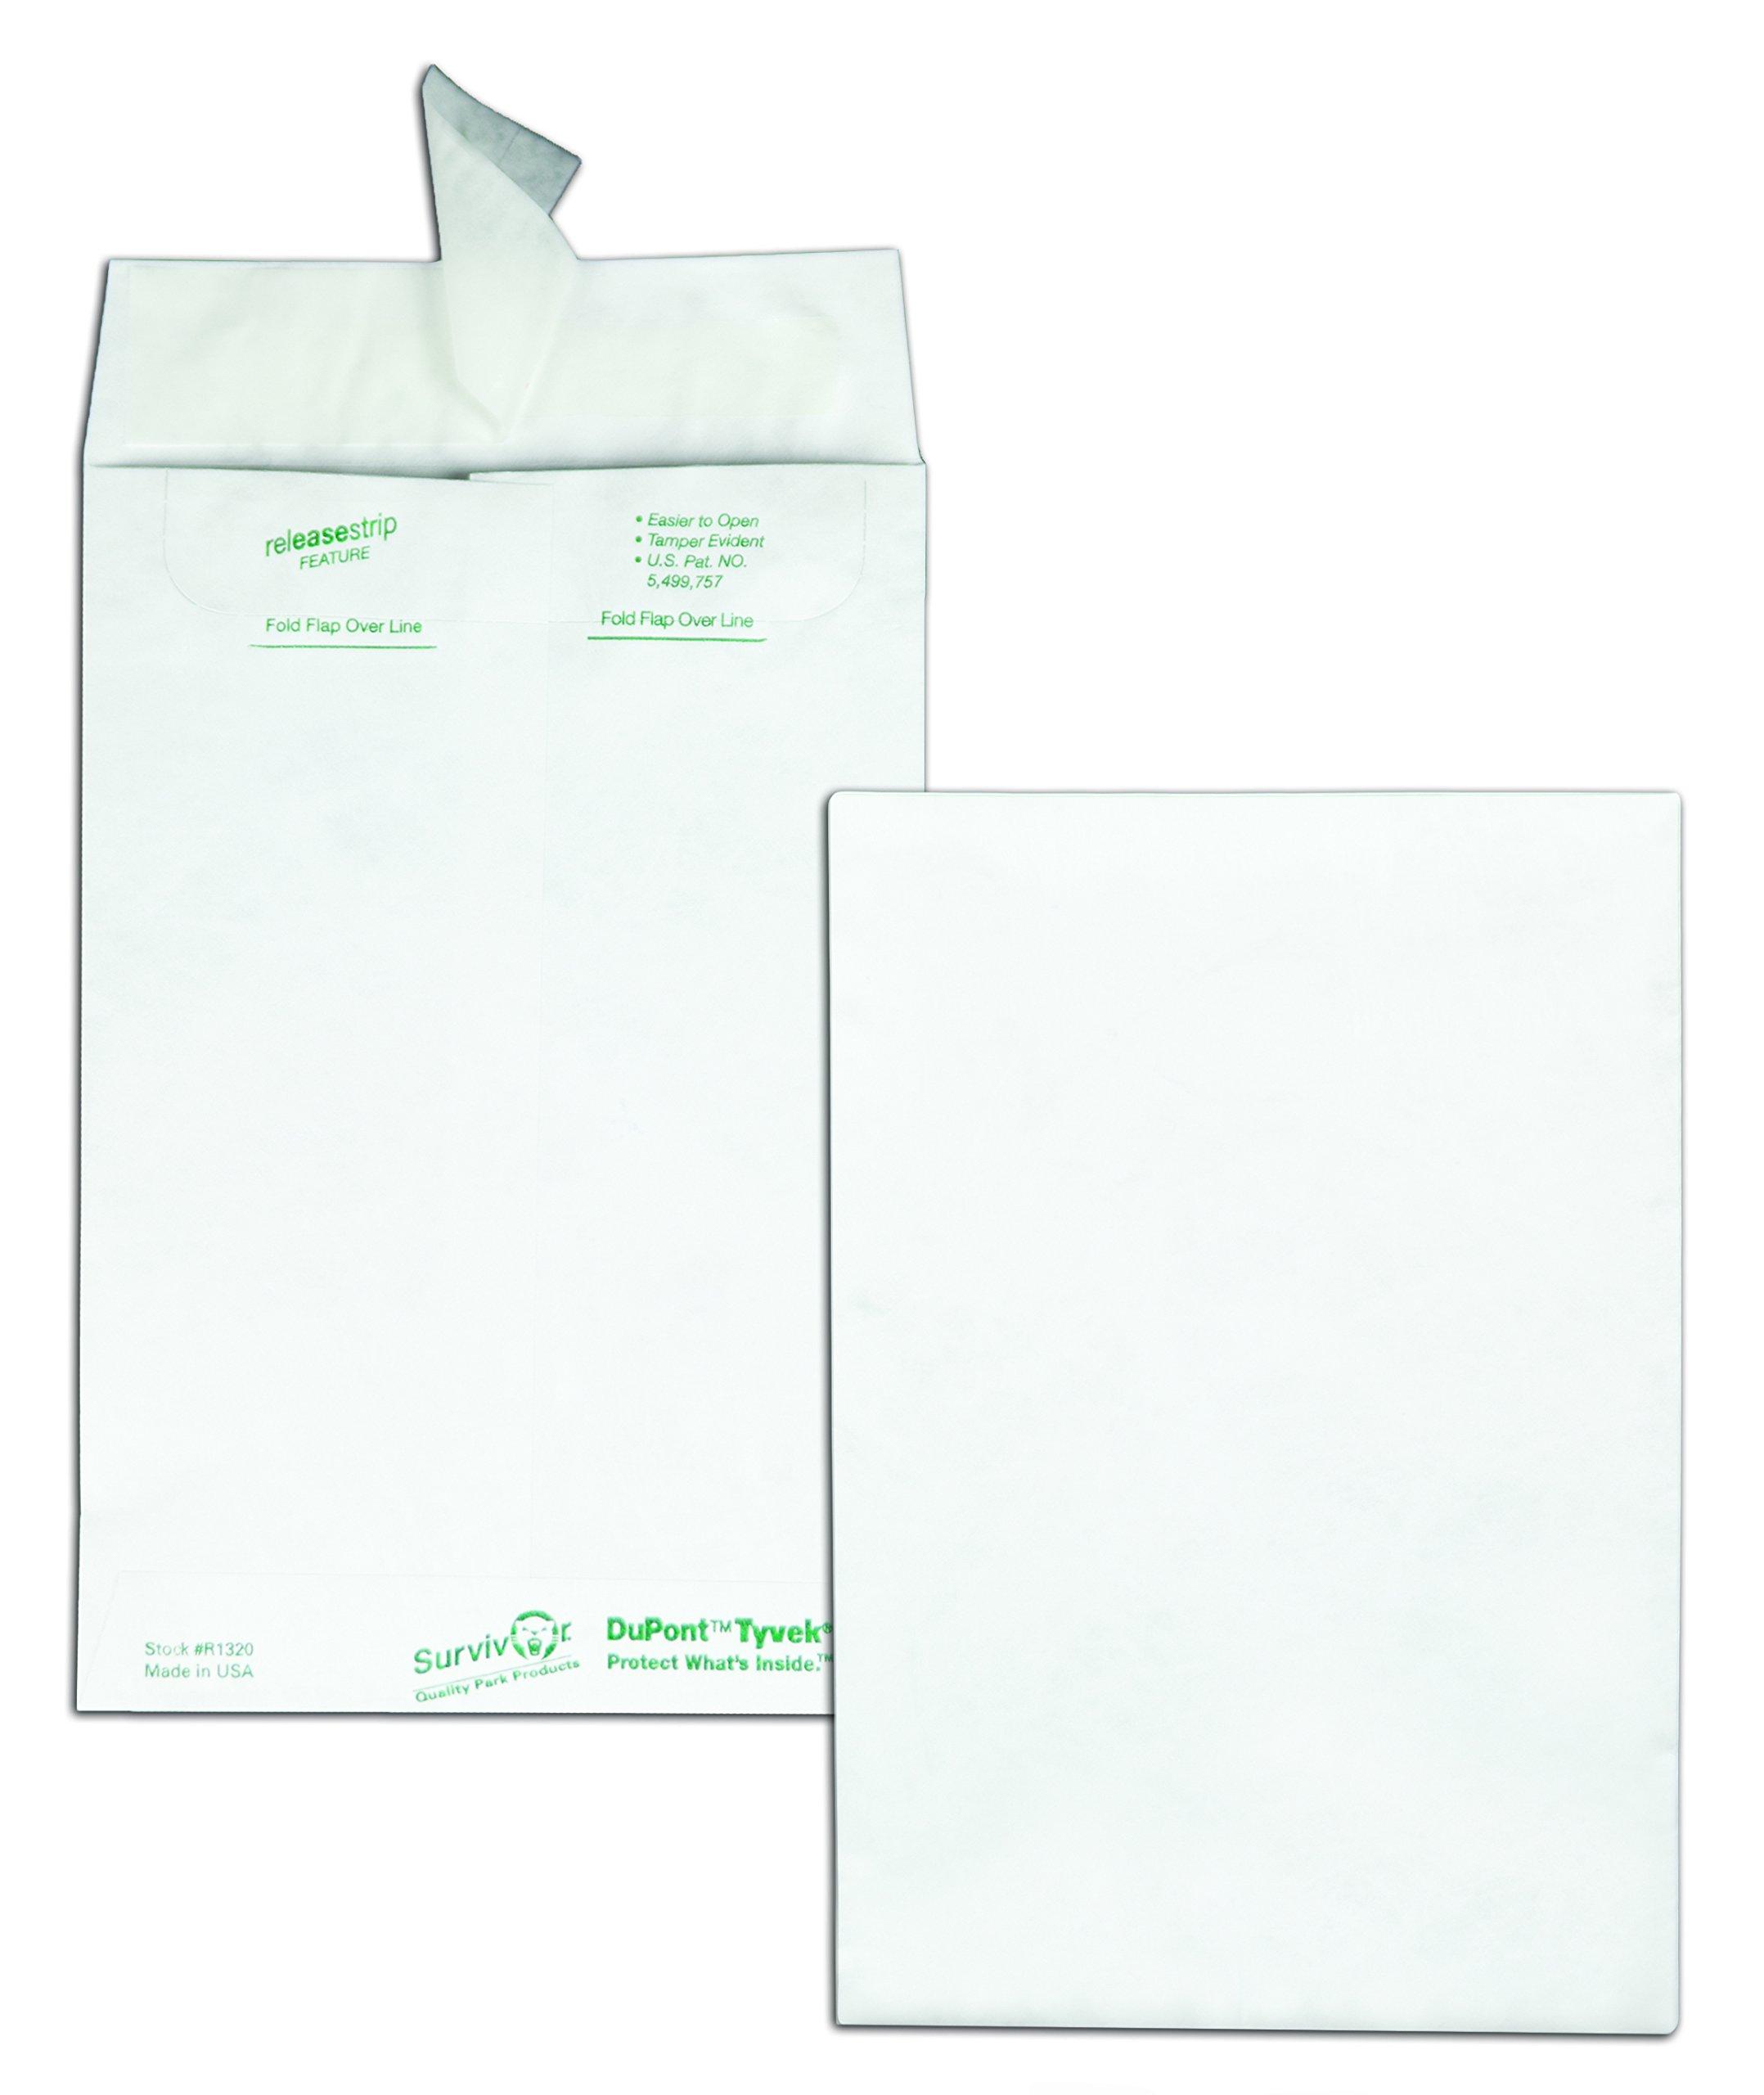 Quality Park tyvek Catalog Envelope, 6 inches x 9 inches, White 100 Envelopes (R1320)